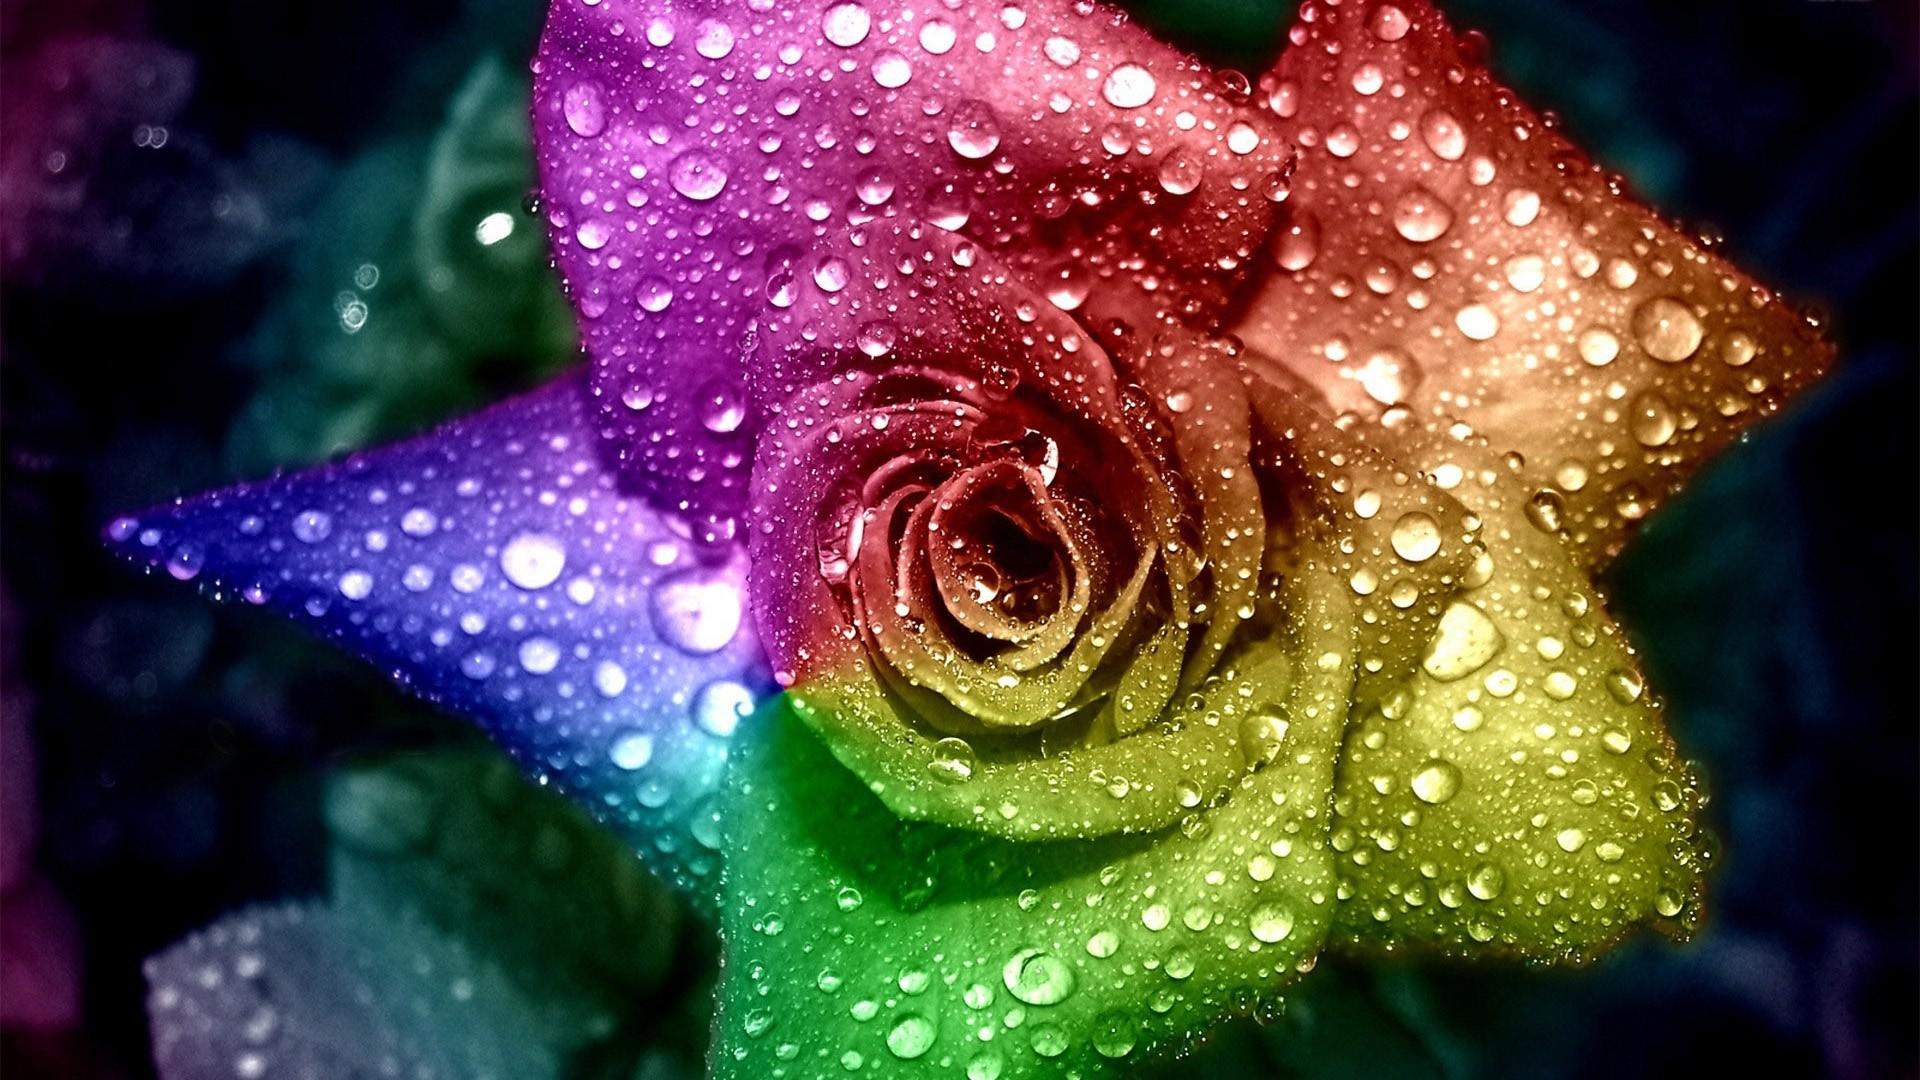 Rainbow Rose hd desktop wallpaper